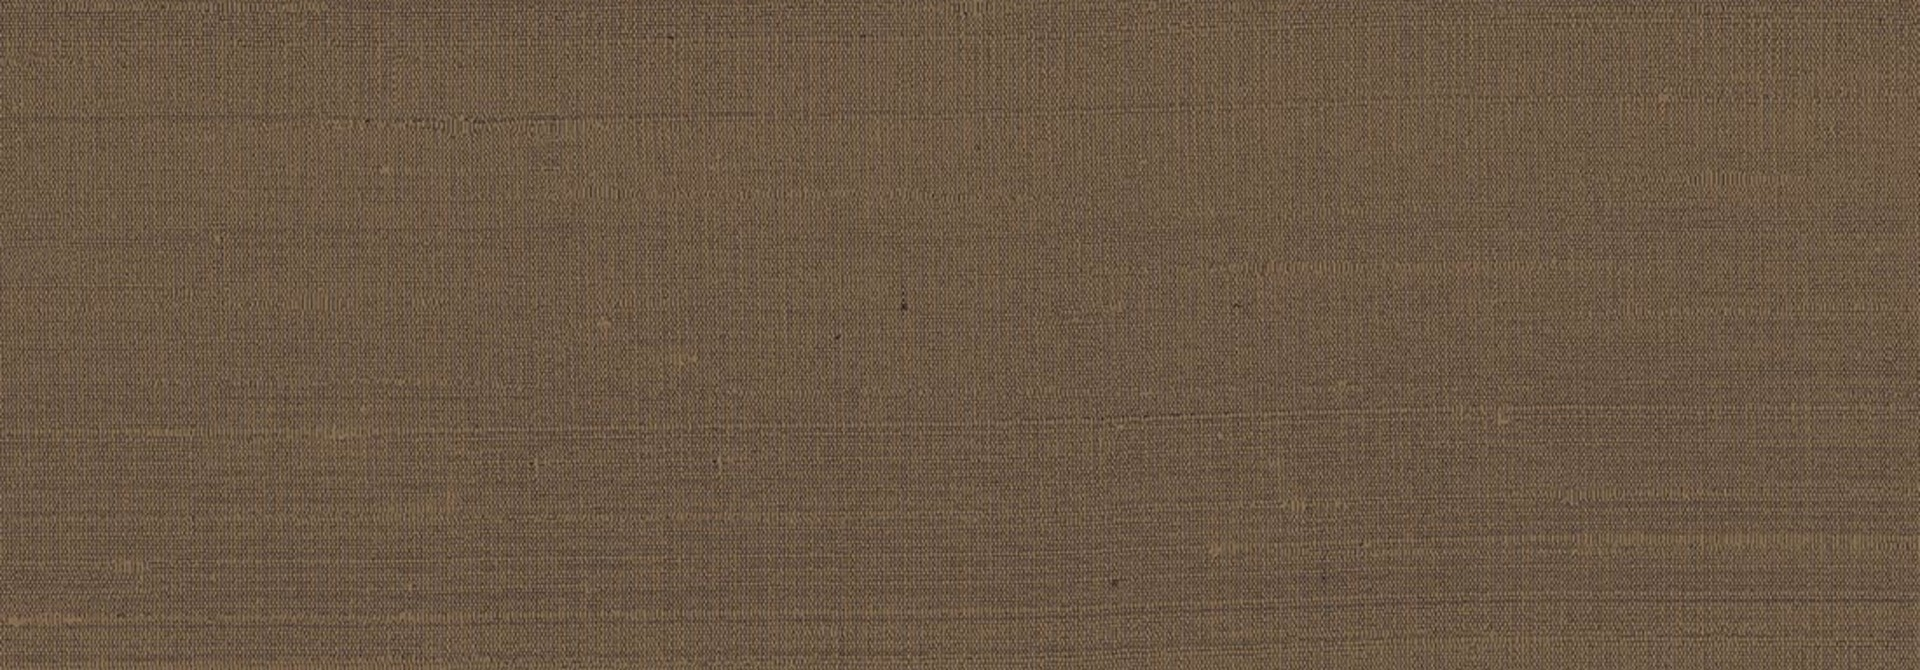 Behang 5089 Tabak